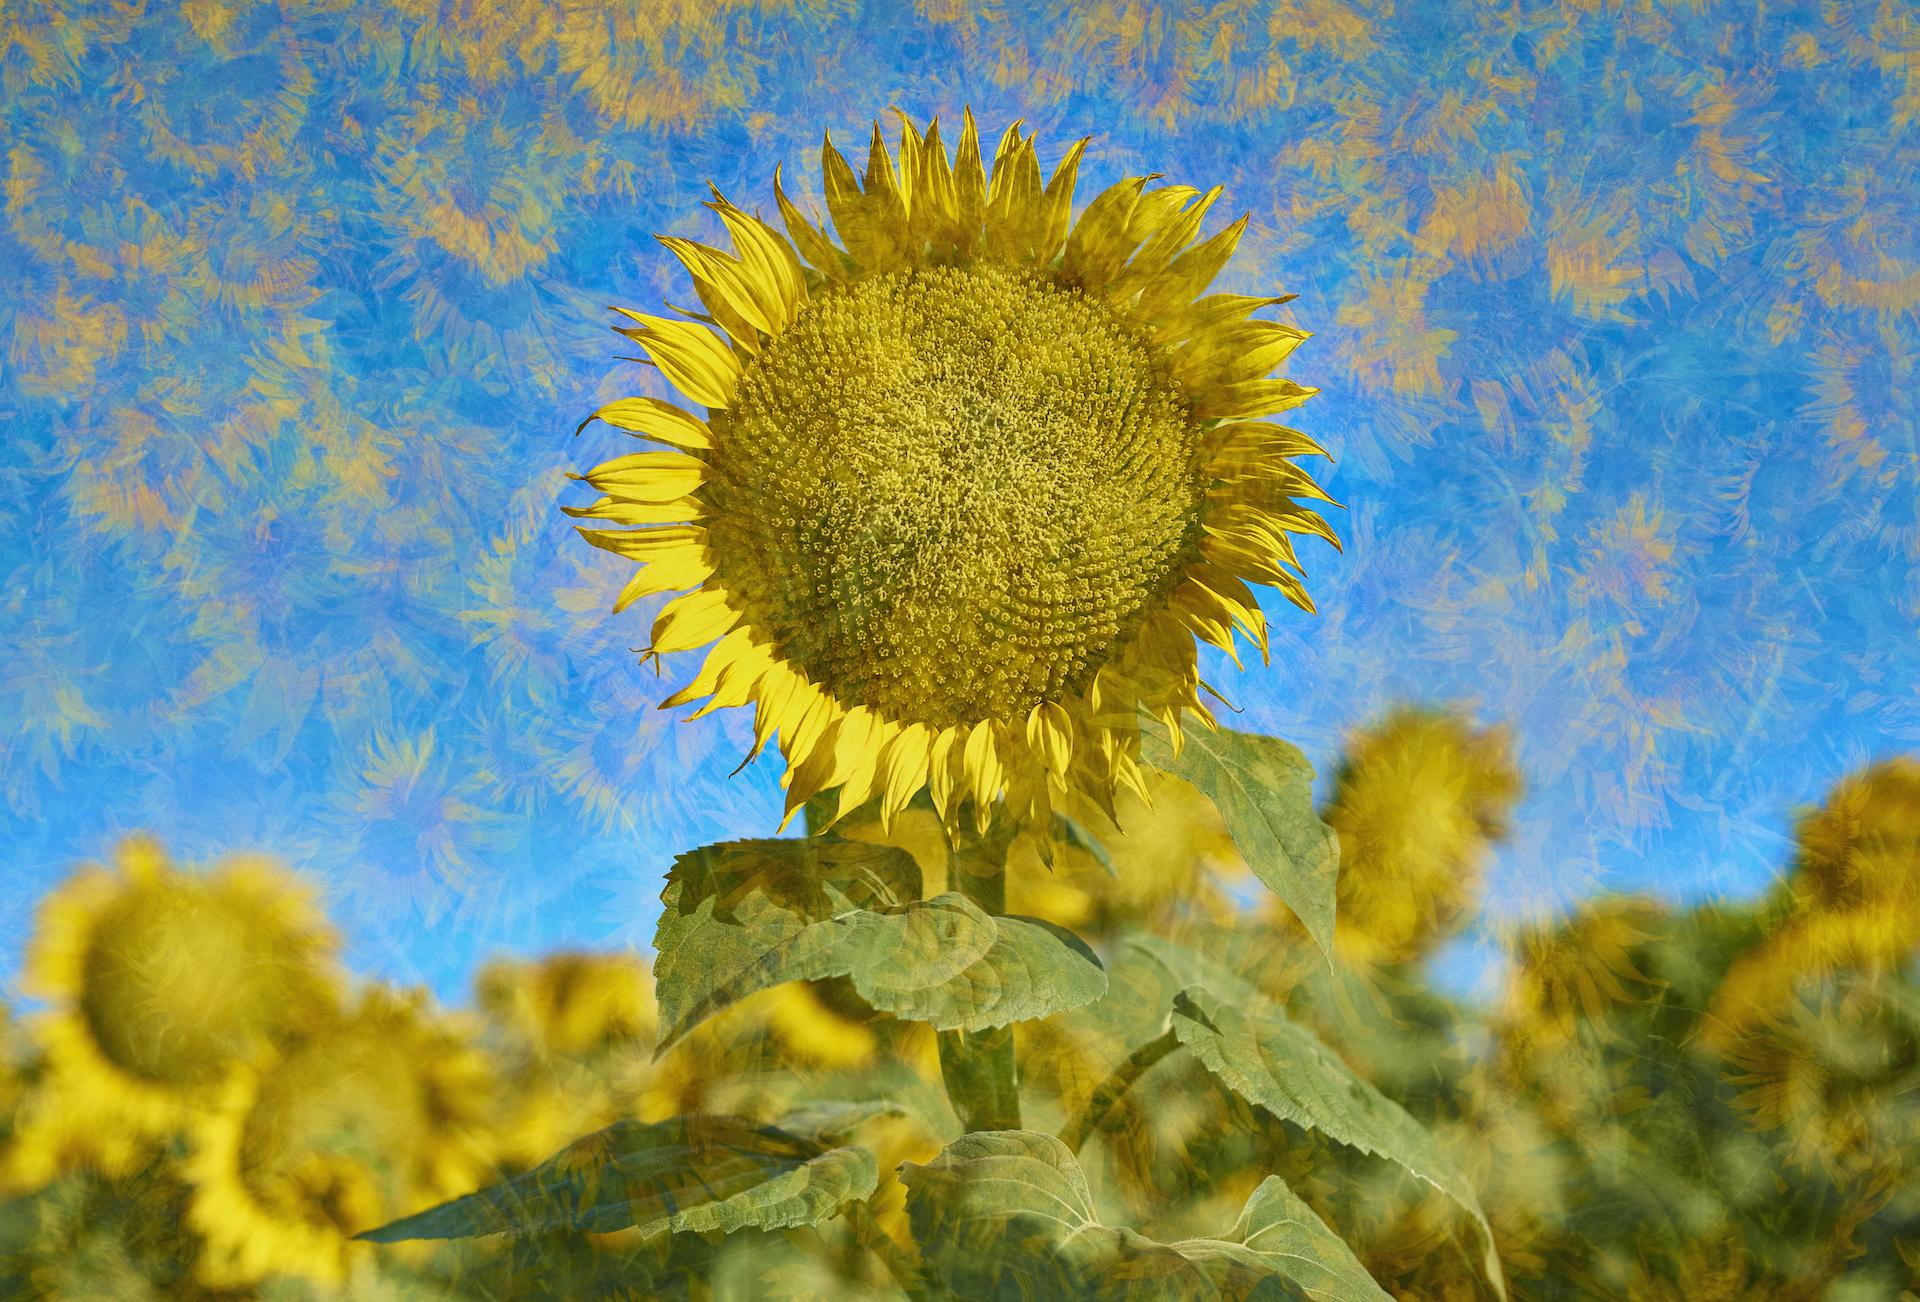 Sunflower Daydream, Alan Fishleder, Photograph